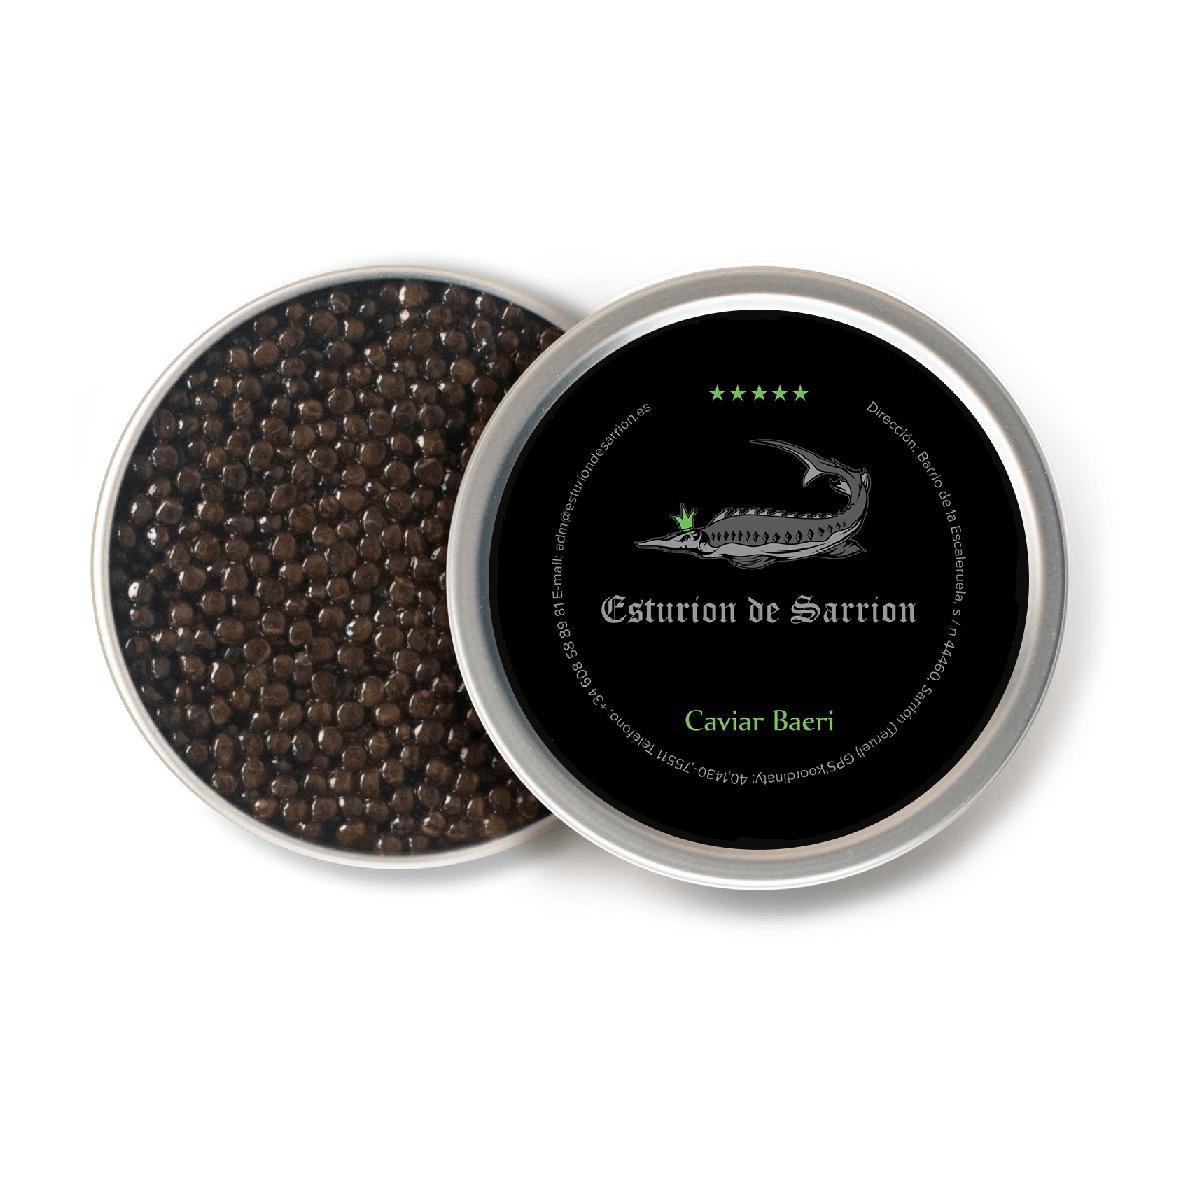 Caviar negro 30g